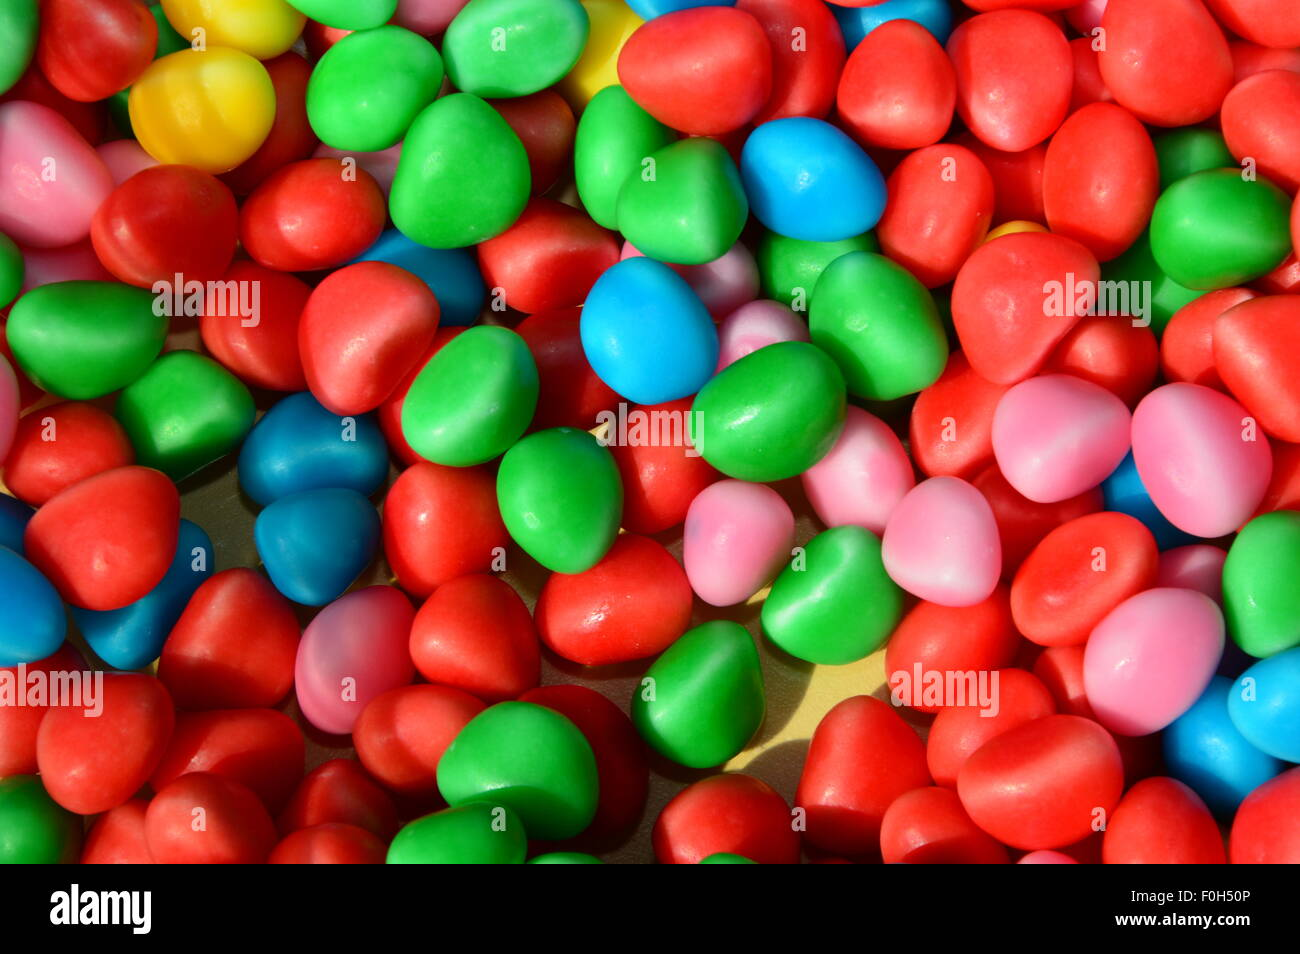 Bonbons - Stock Image